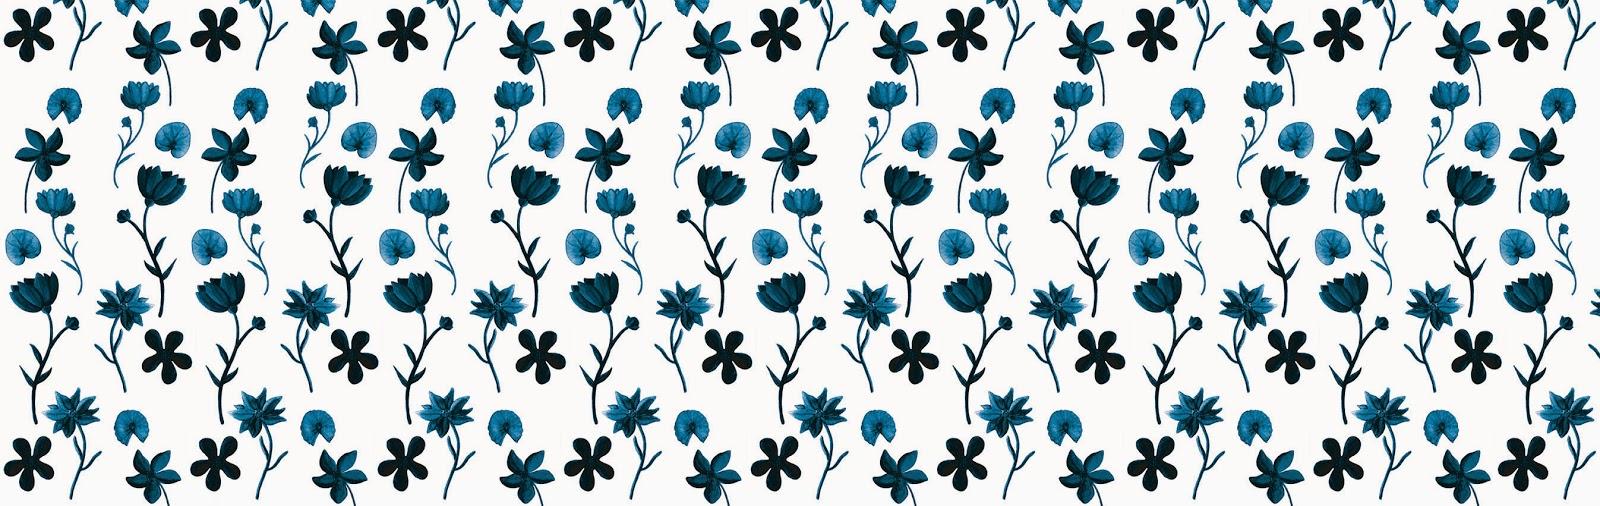 Blue Flowers - Jen Haugan Animation & Illustration